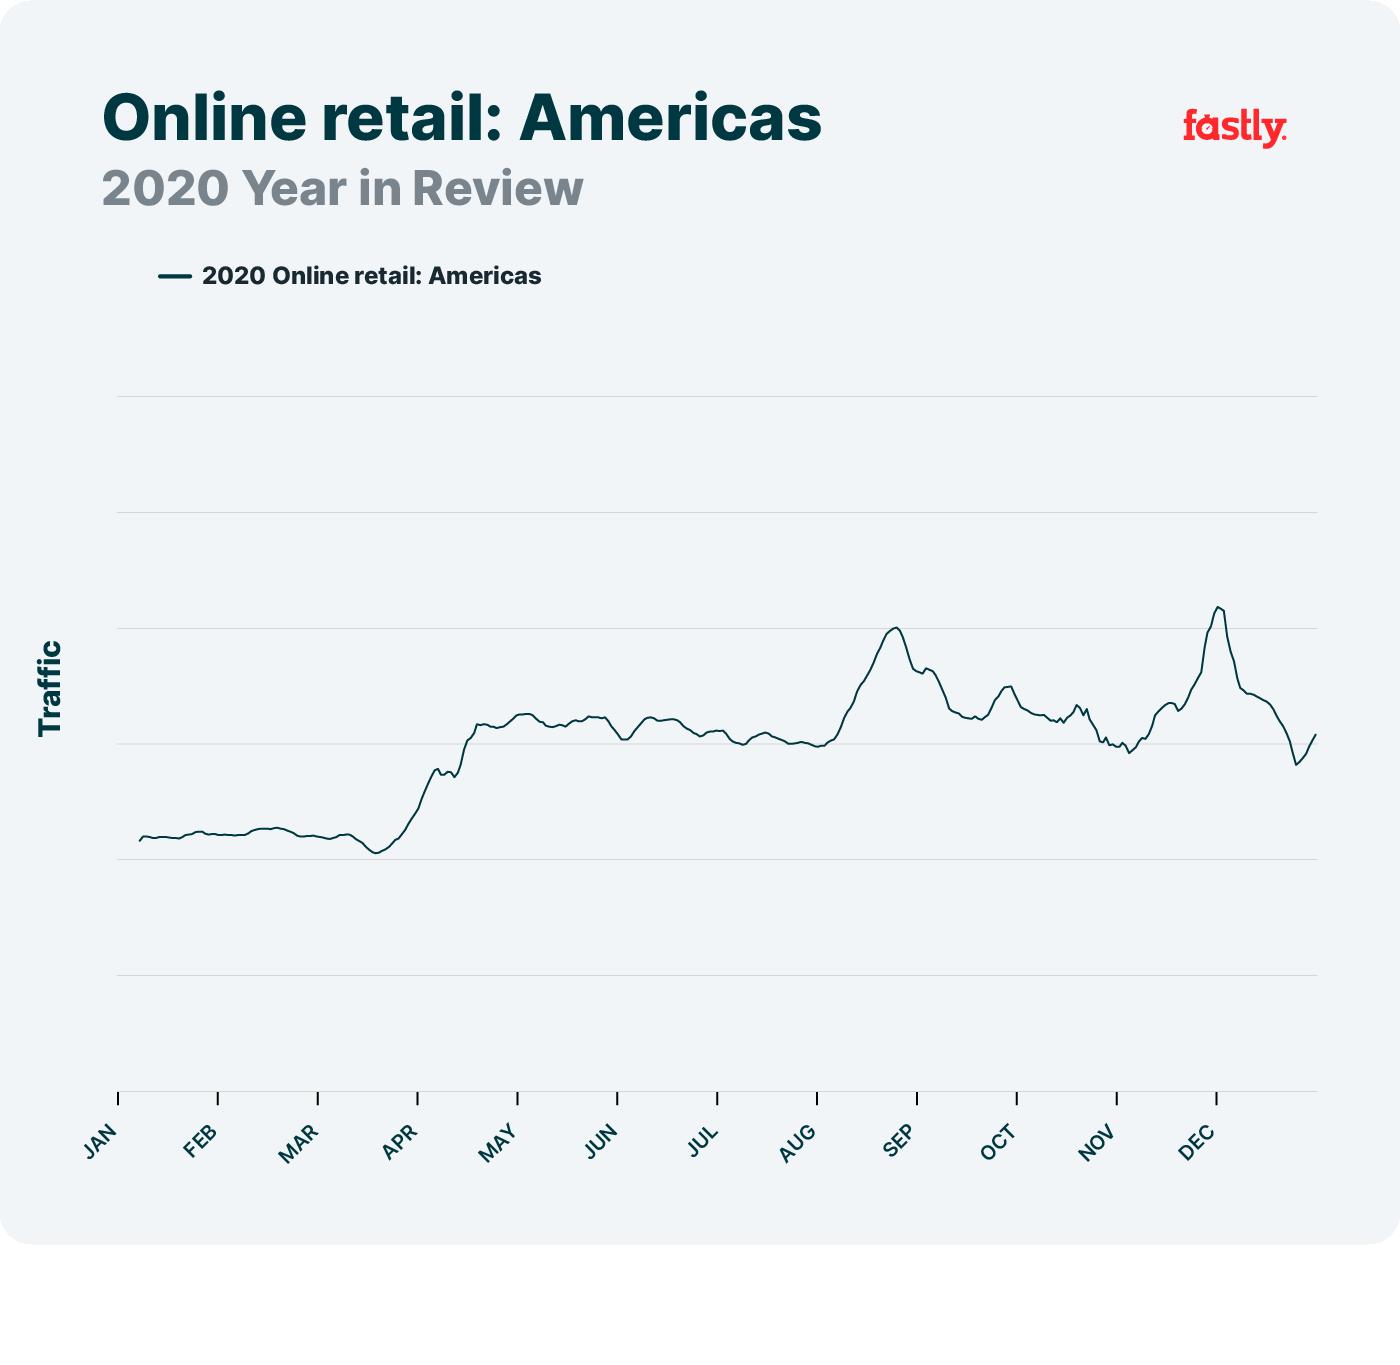 Online retail Americas, network trends 2020